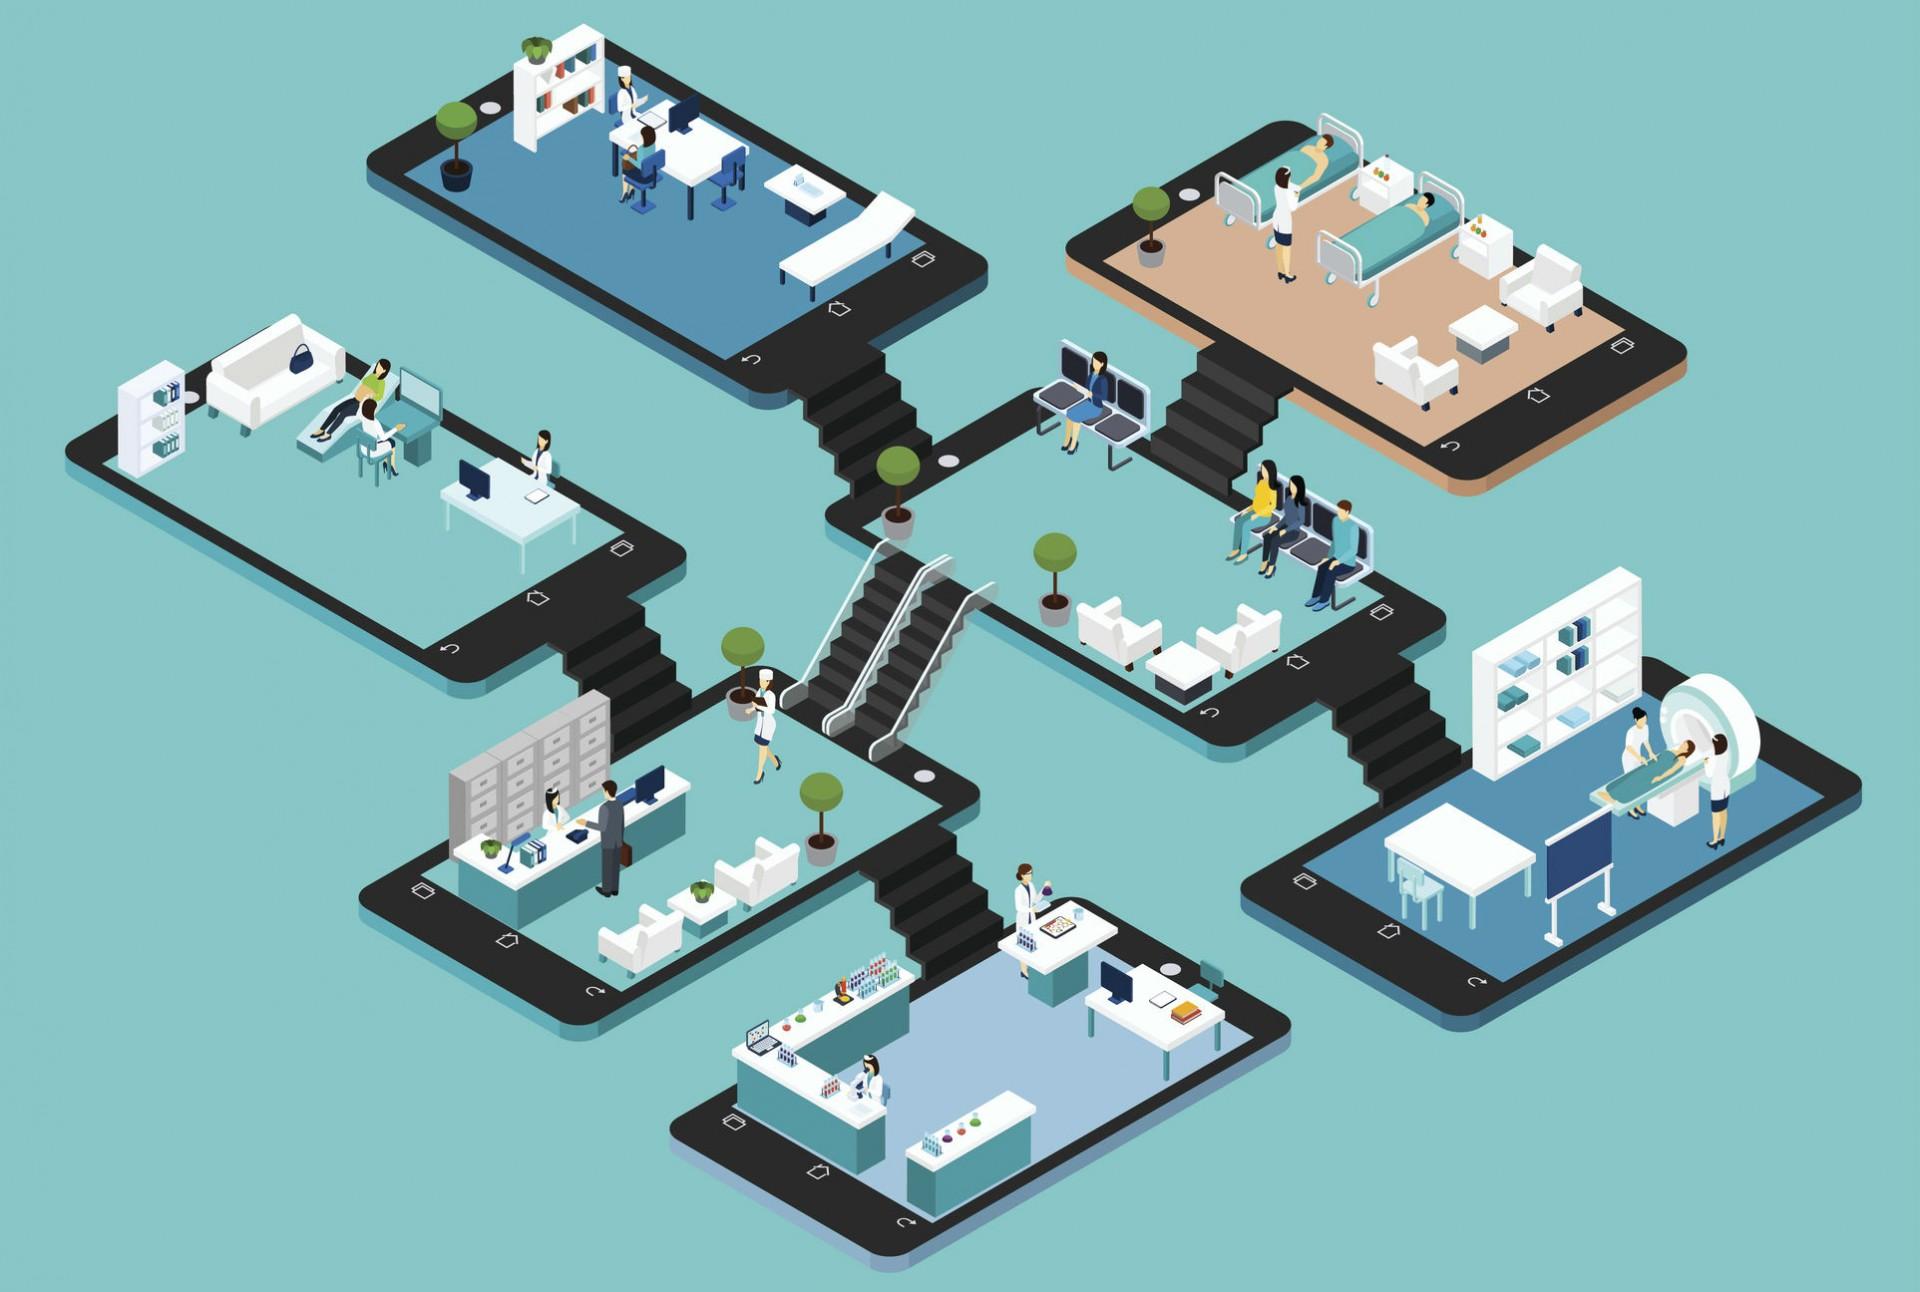 5G Network Infrastructure Improves Telemedicine, Remote Care